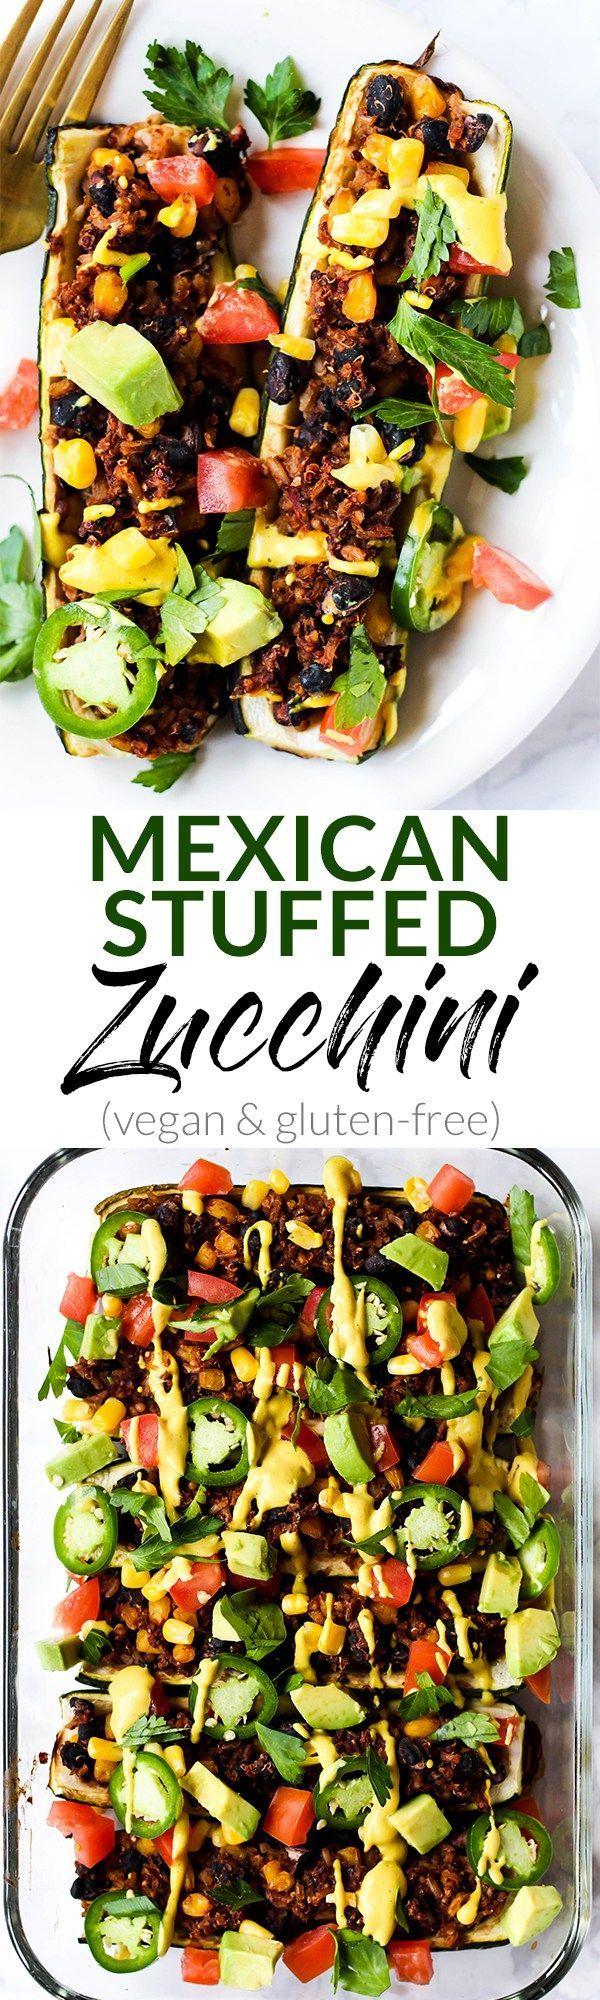 Mexican Stuffed Zucchini Vegan Gluten Free